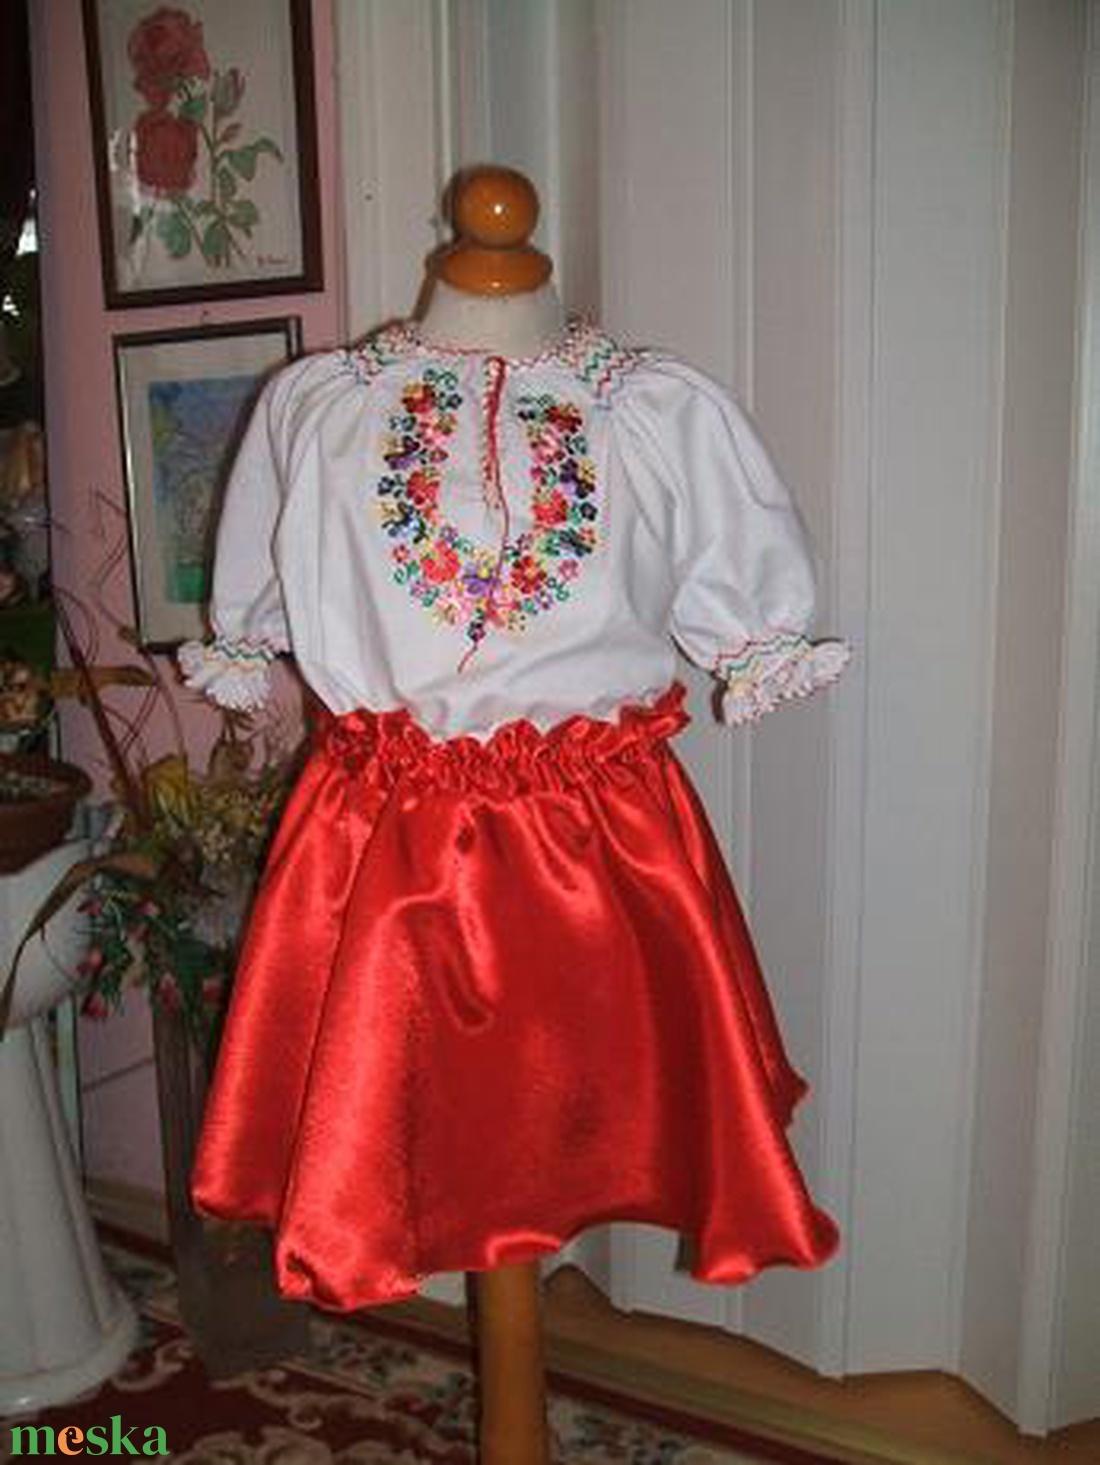 Magyaros, népviseleti lányka ruha. - ruha & divat - babaruha & gyerekruha - ruha - Meska.hu